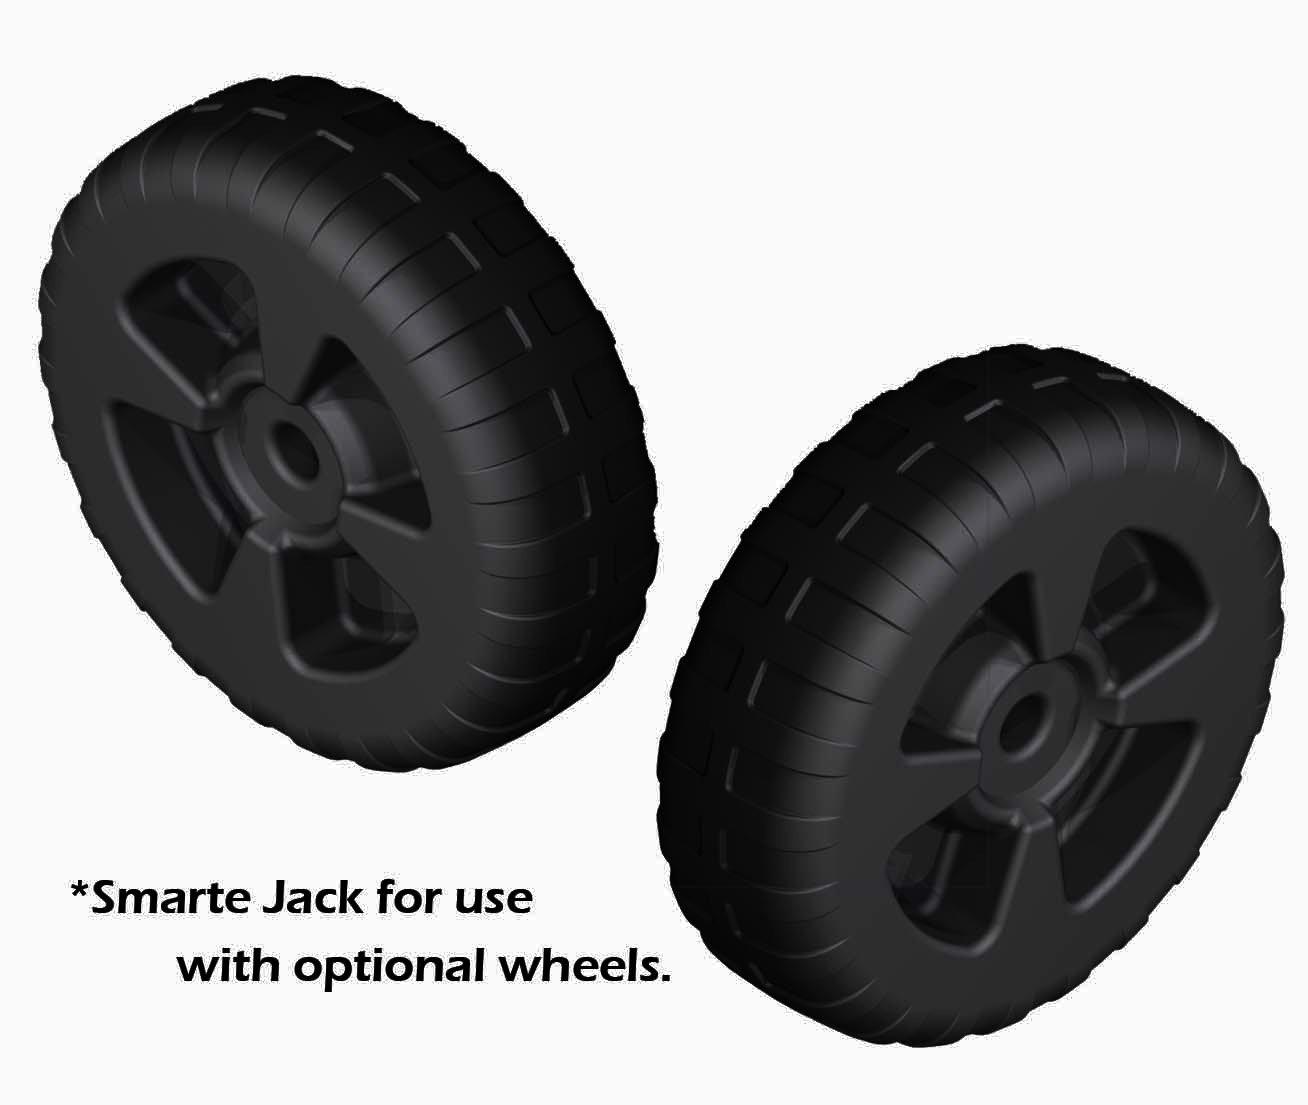 Smarte Jack Wheel (Two Wheels) Quality Mark